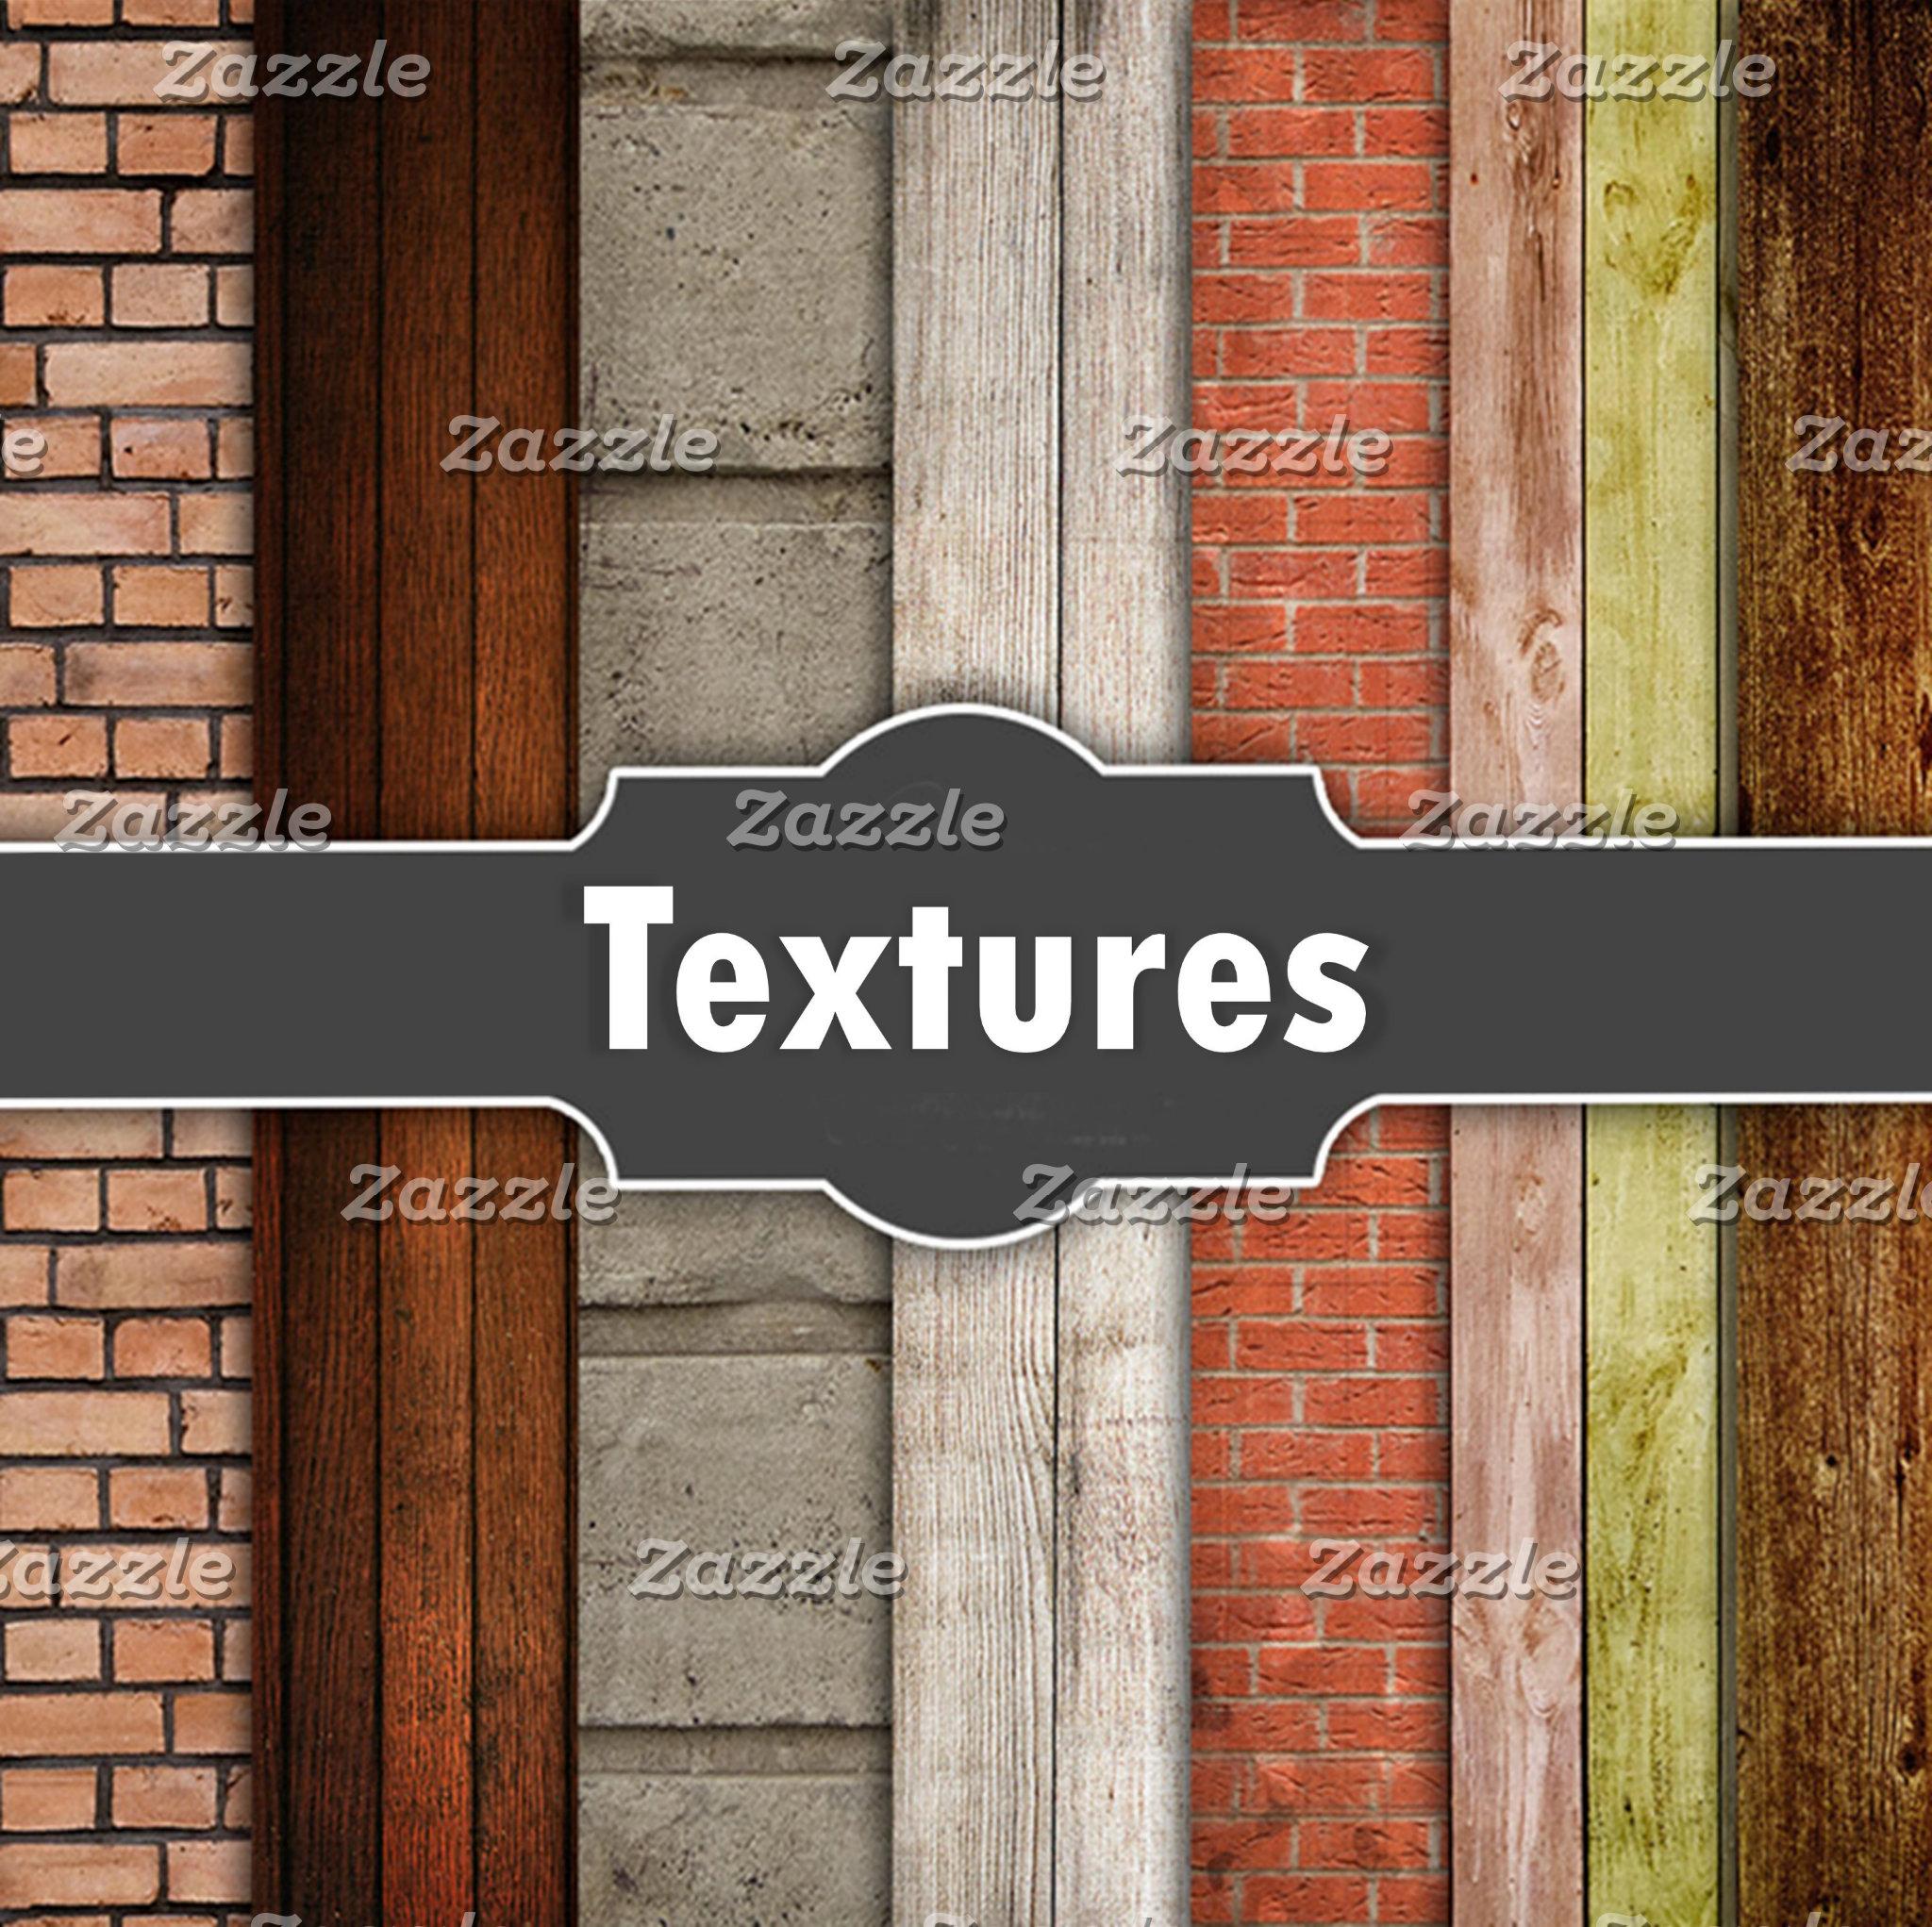 TEXTURES, Elements